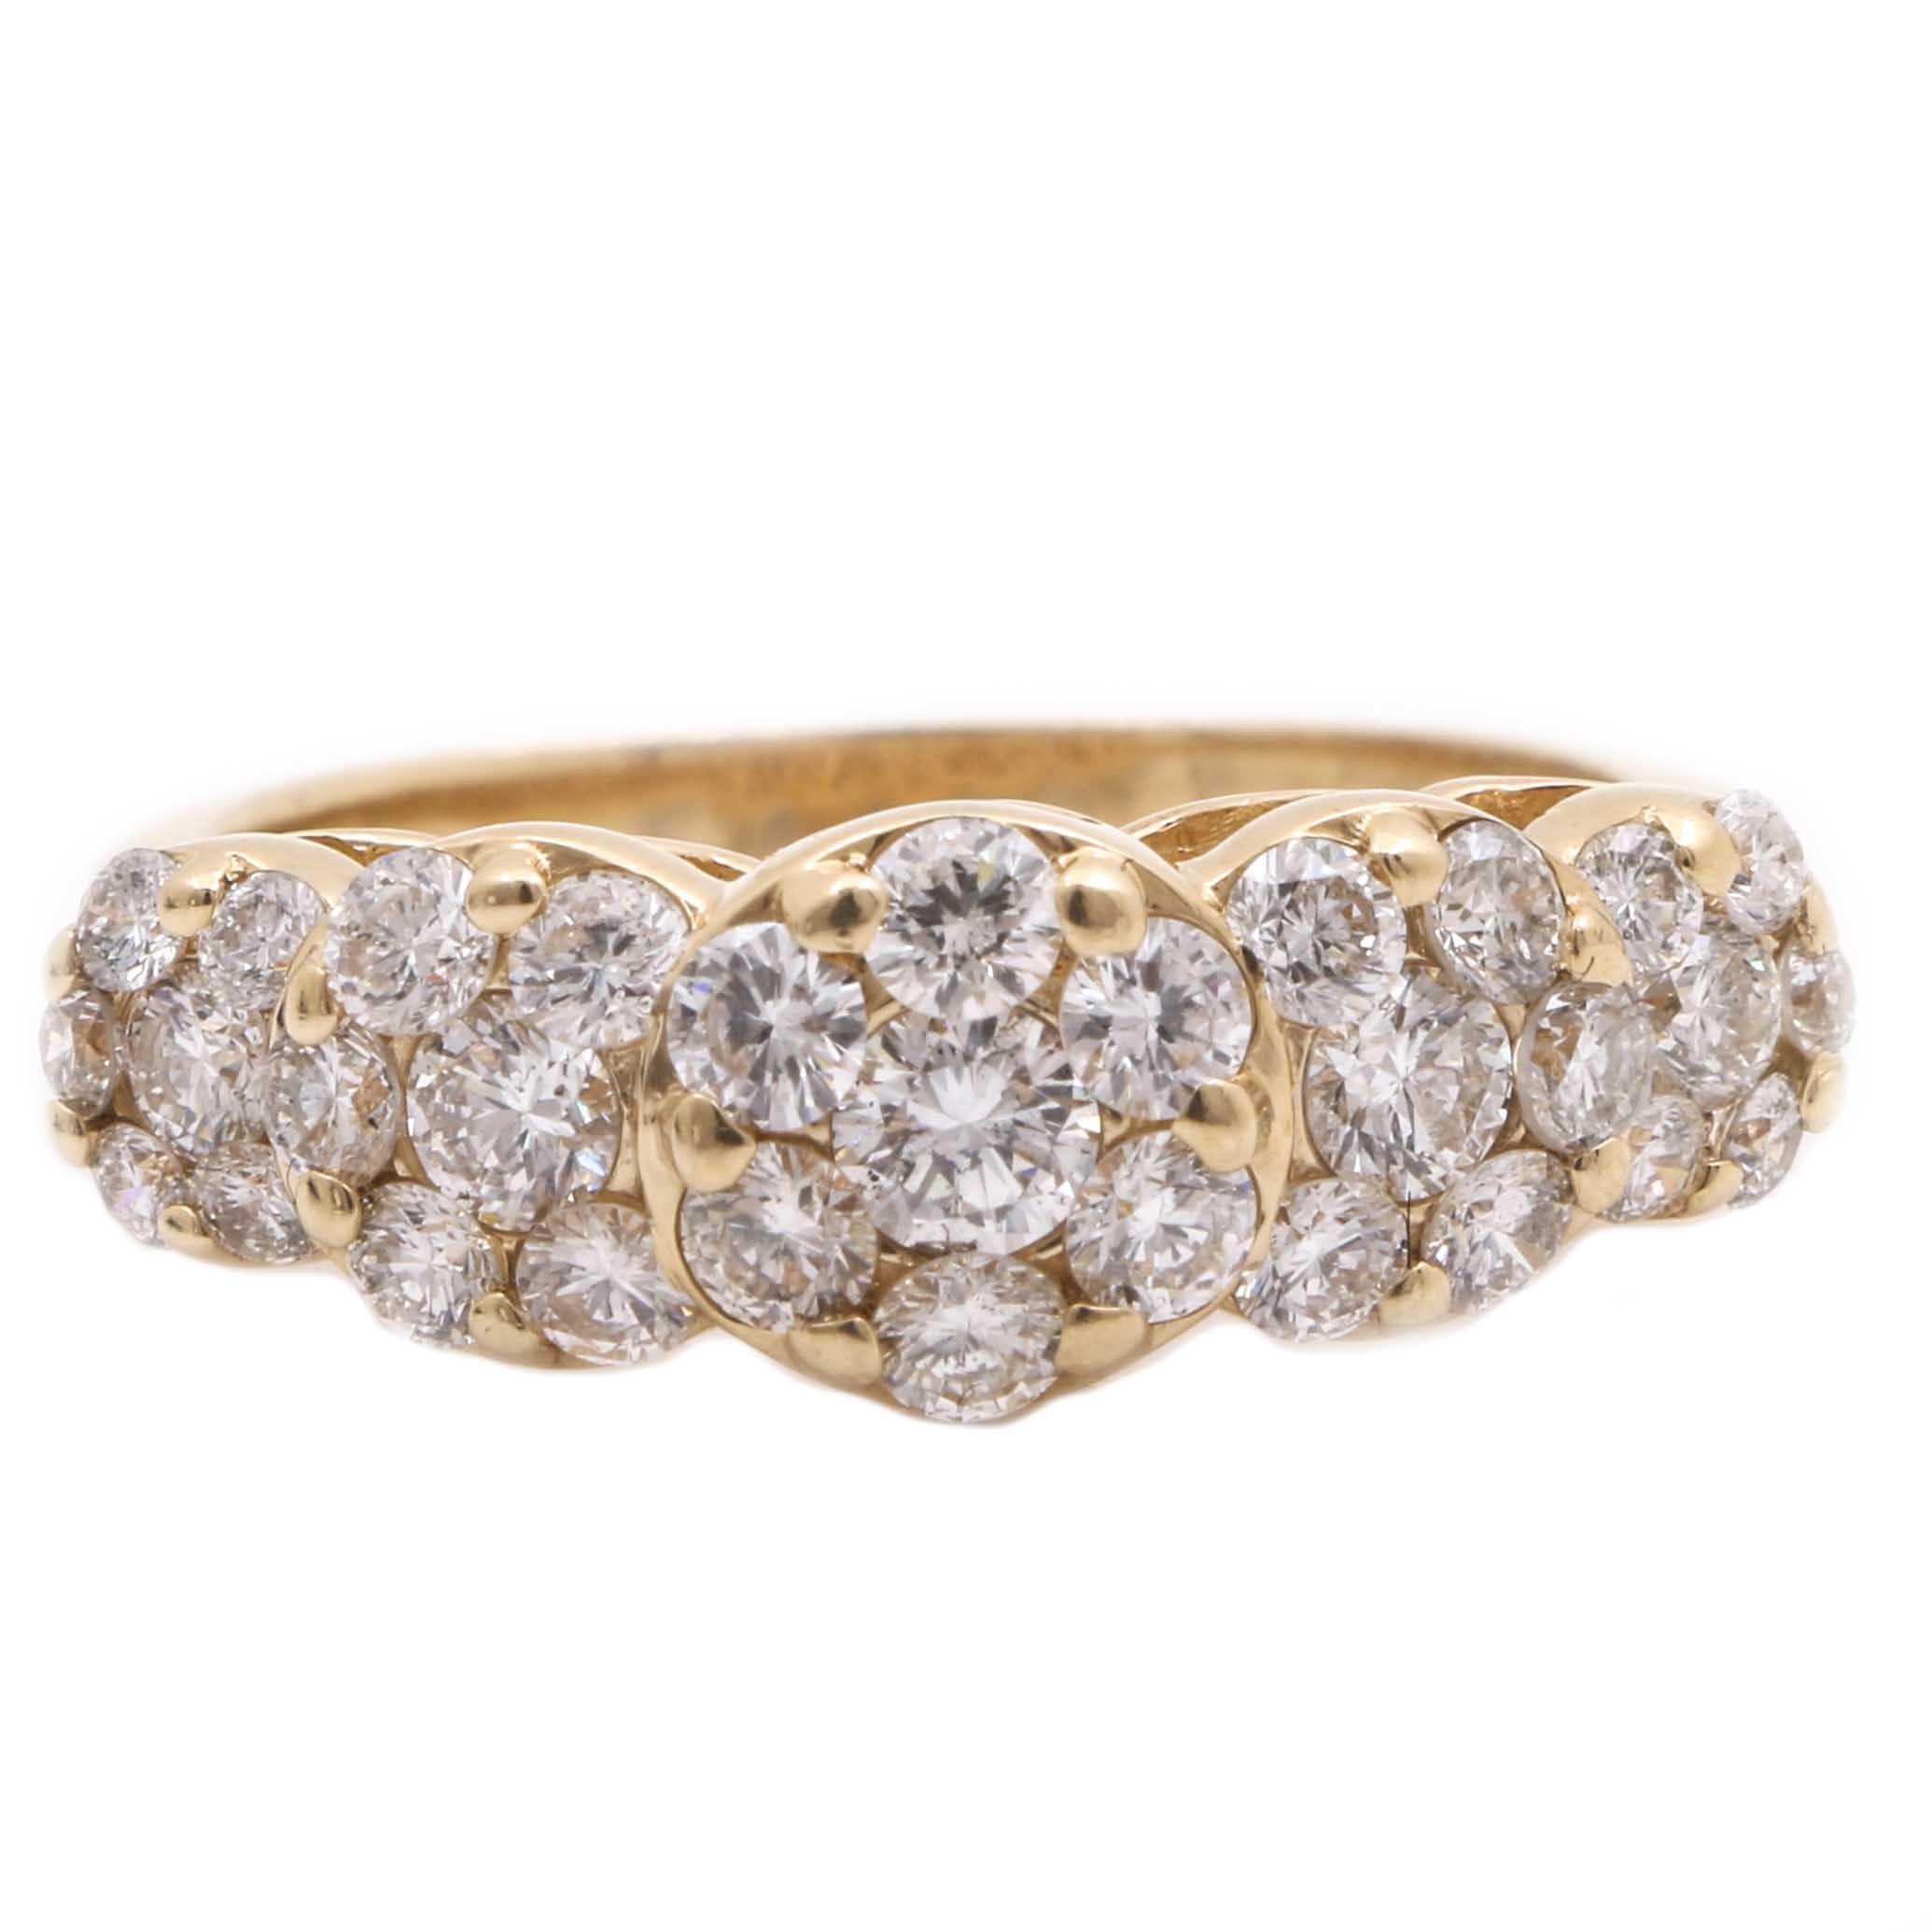 14K Yellow Gold 1.41 CTW Diamond Ring